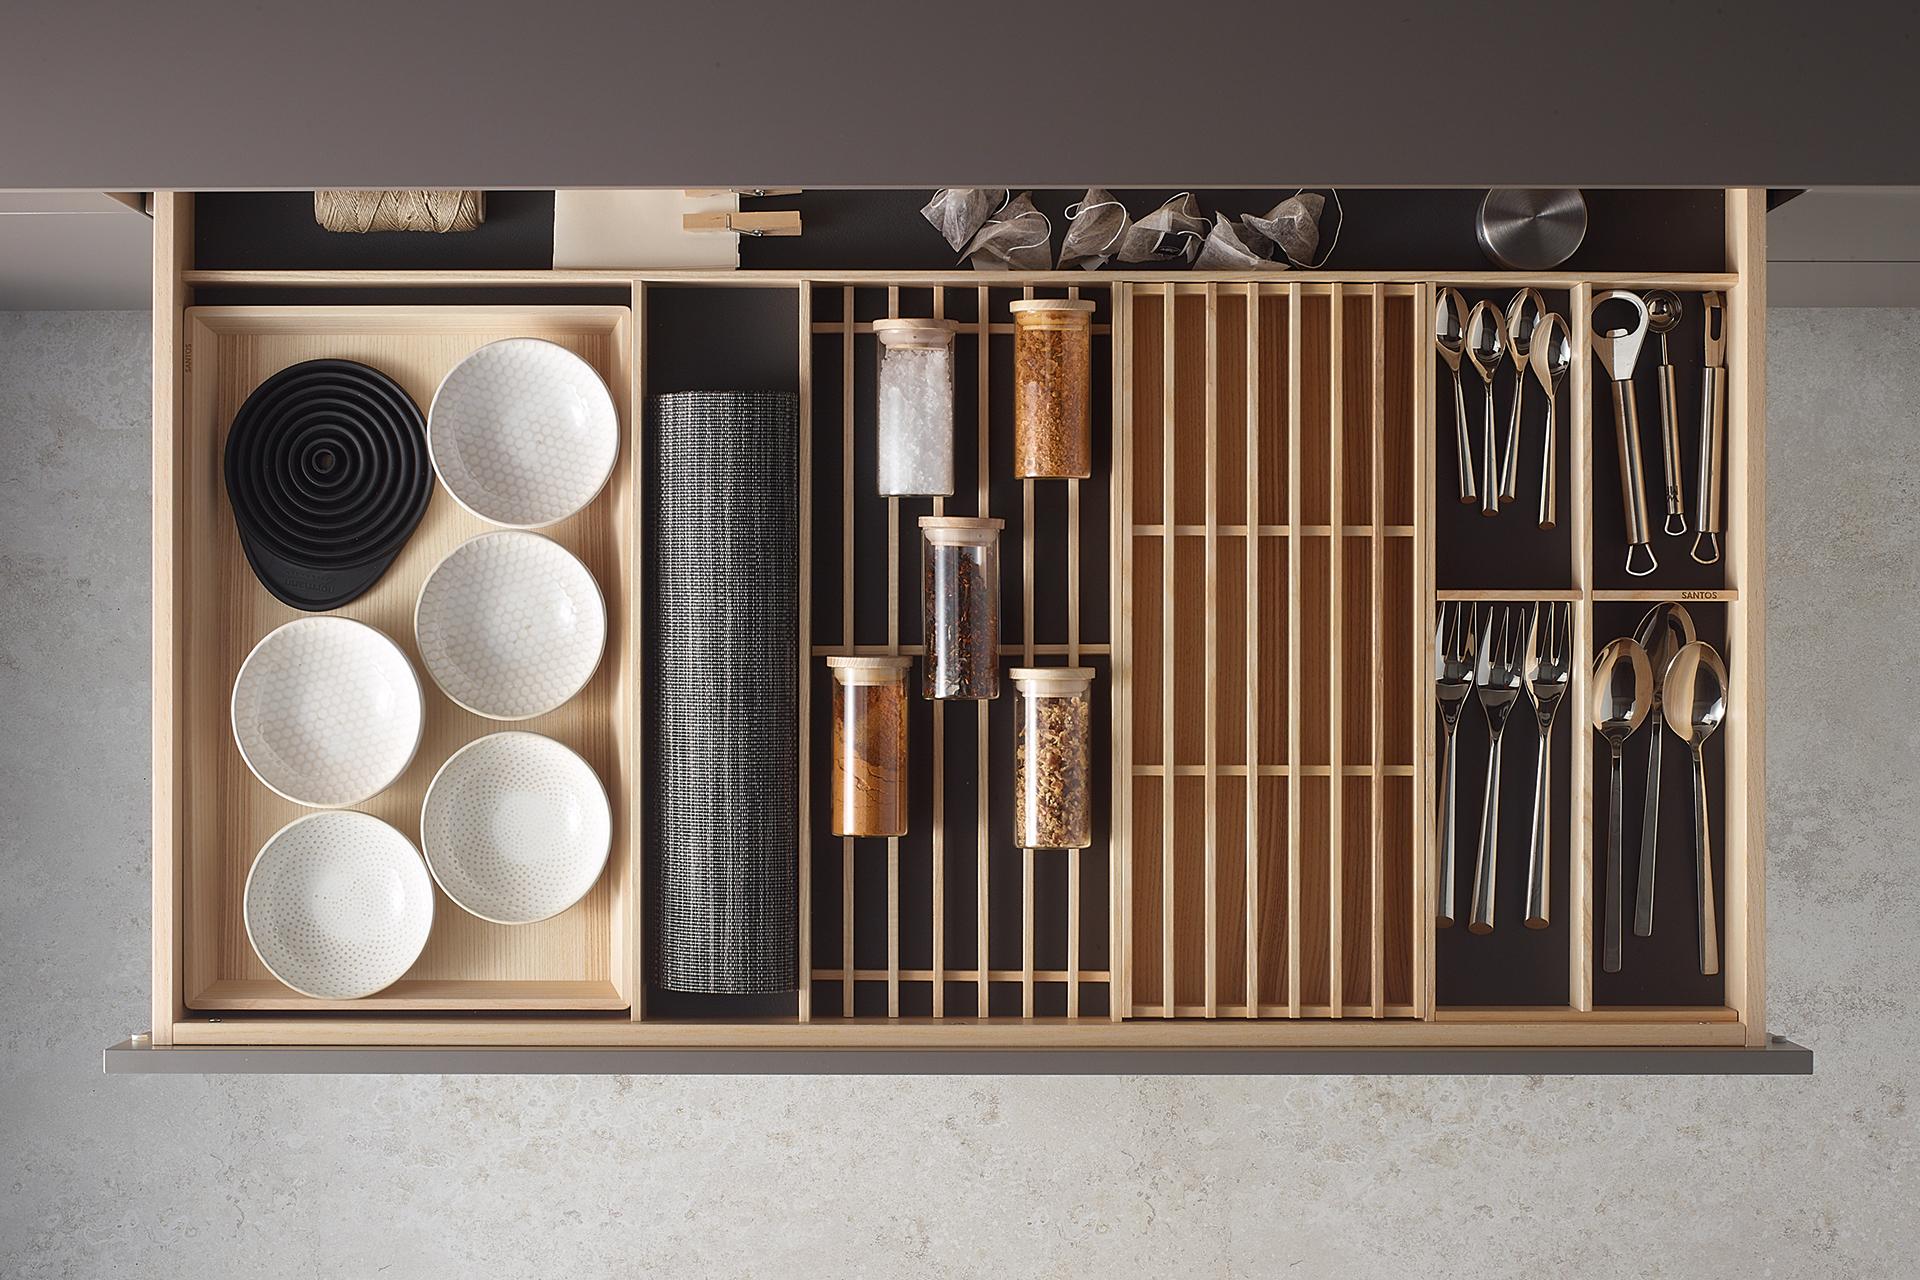 Accessories for Santos kitchen drawer: cutlery tray